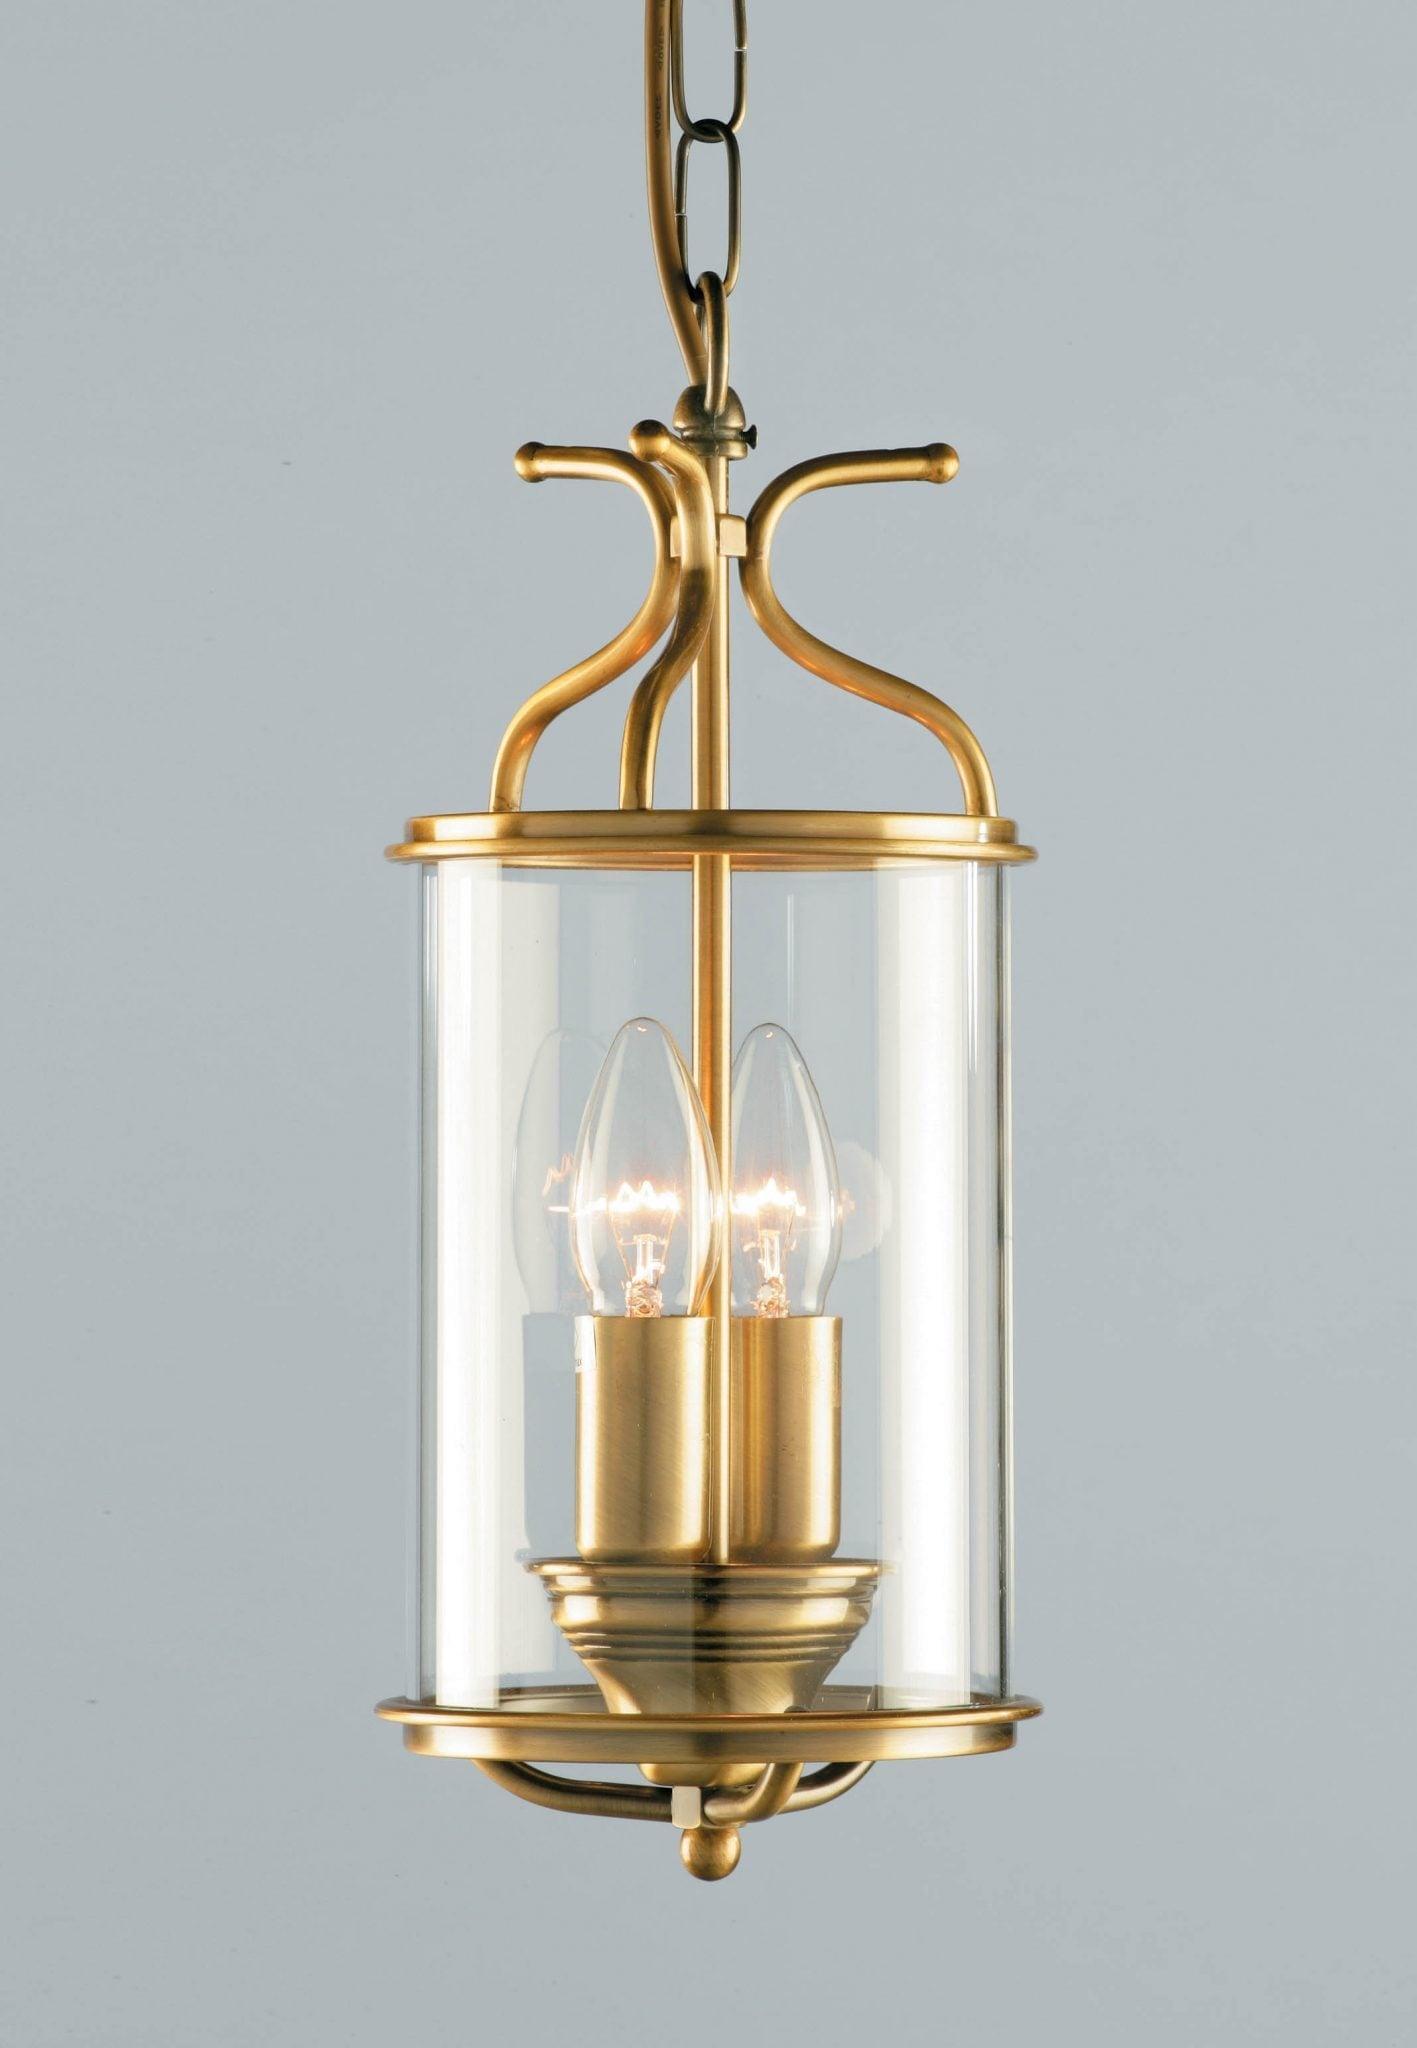 Impex LG00029/AB Winchester 2 light Lantern, Antique Brass